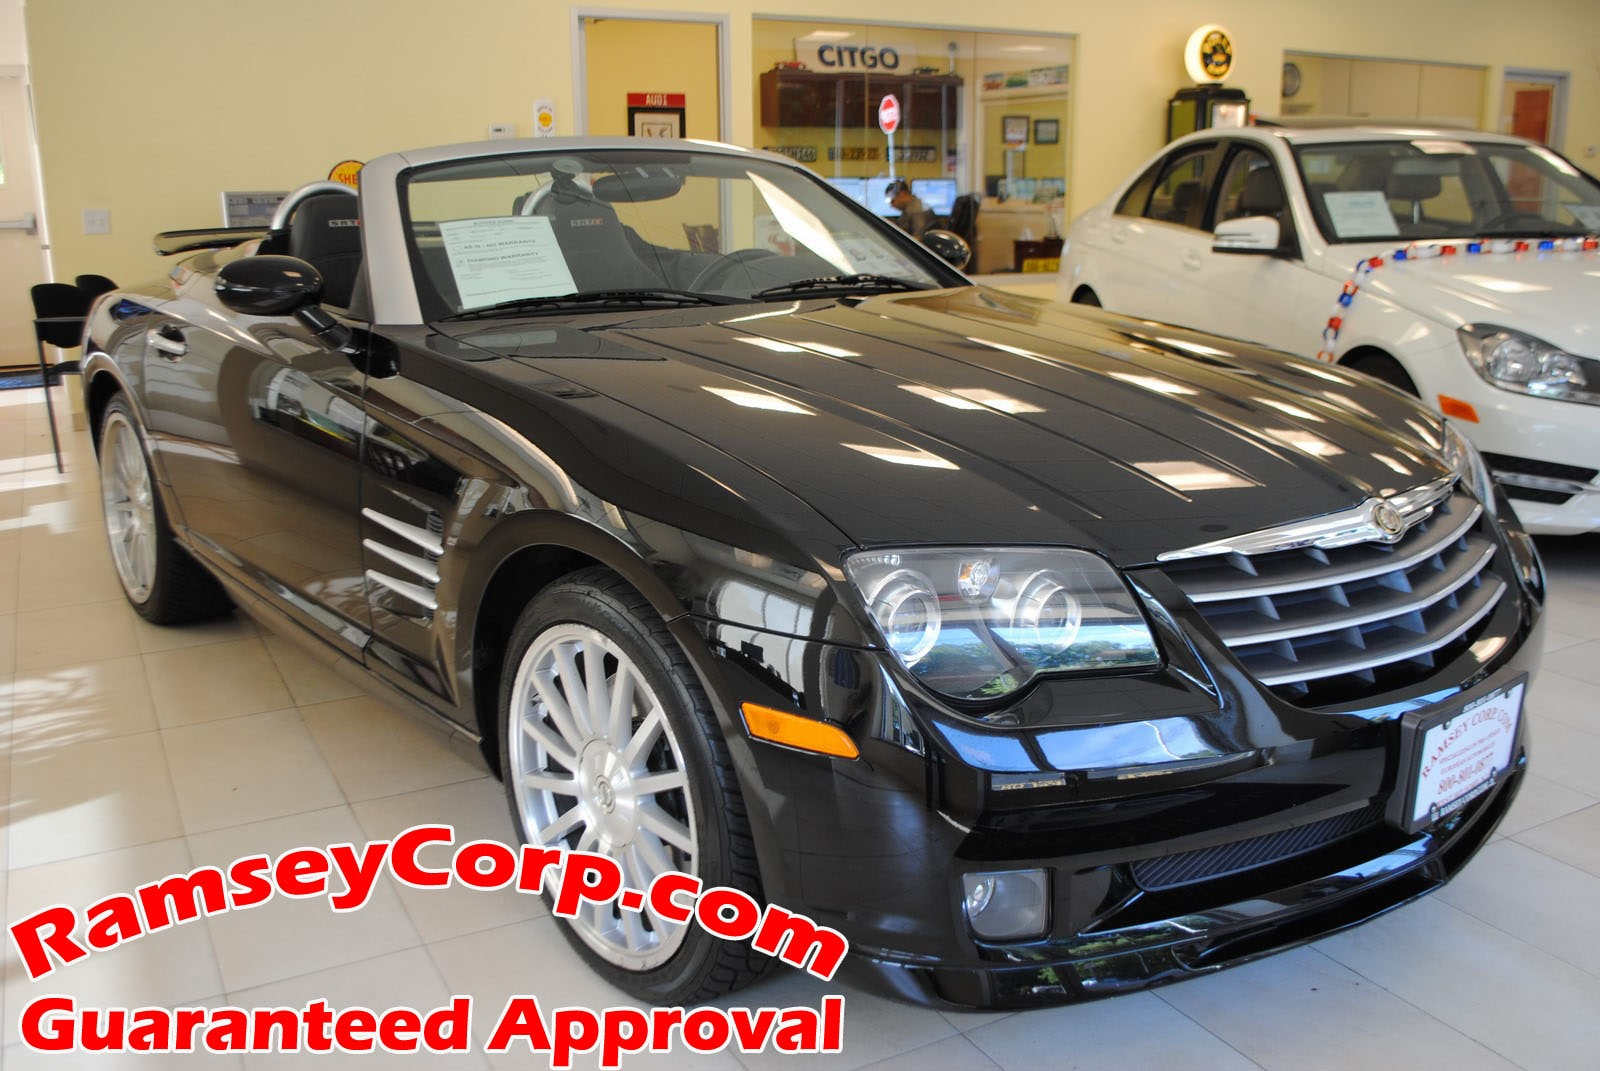 used 2005 chrysler crossfire for sale west milford nj rh ramseycorp com 2014 Chrysler Crossfire Chrysler Crossfire SRT 6 Engine